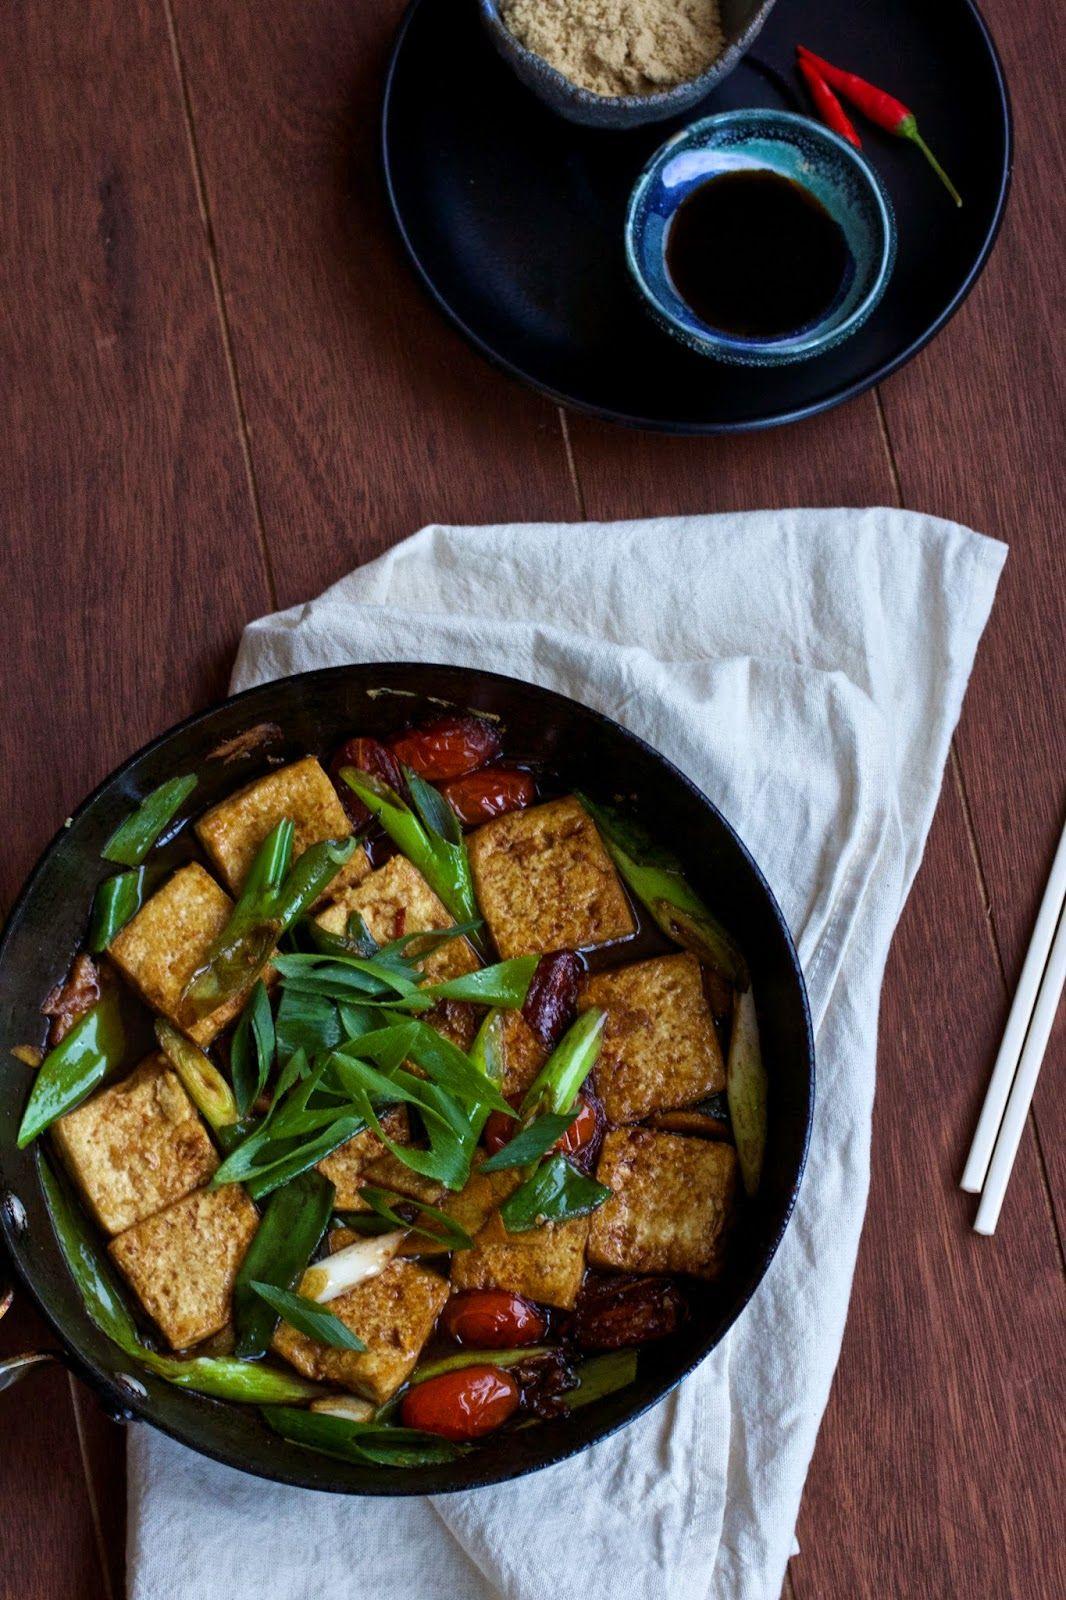 Kylie Kwong S Braised Tofu With Tomatoes Tofu Tomatoes Kyliekwong Tofu Vegetarian Tofu